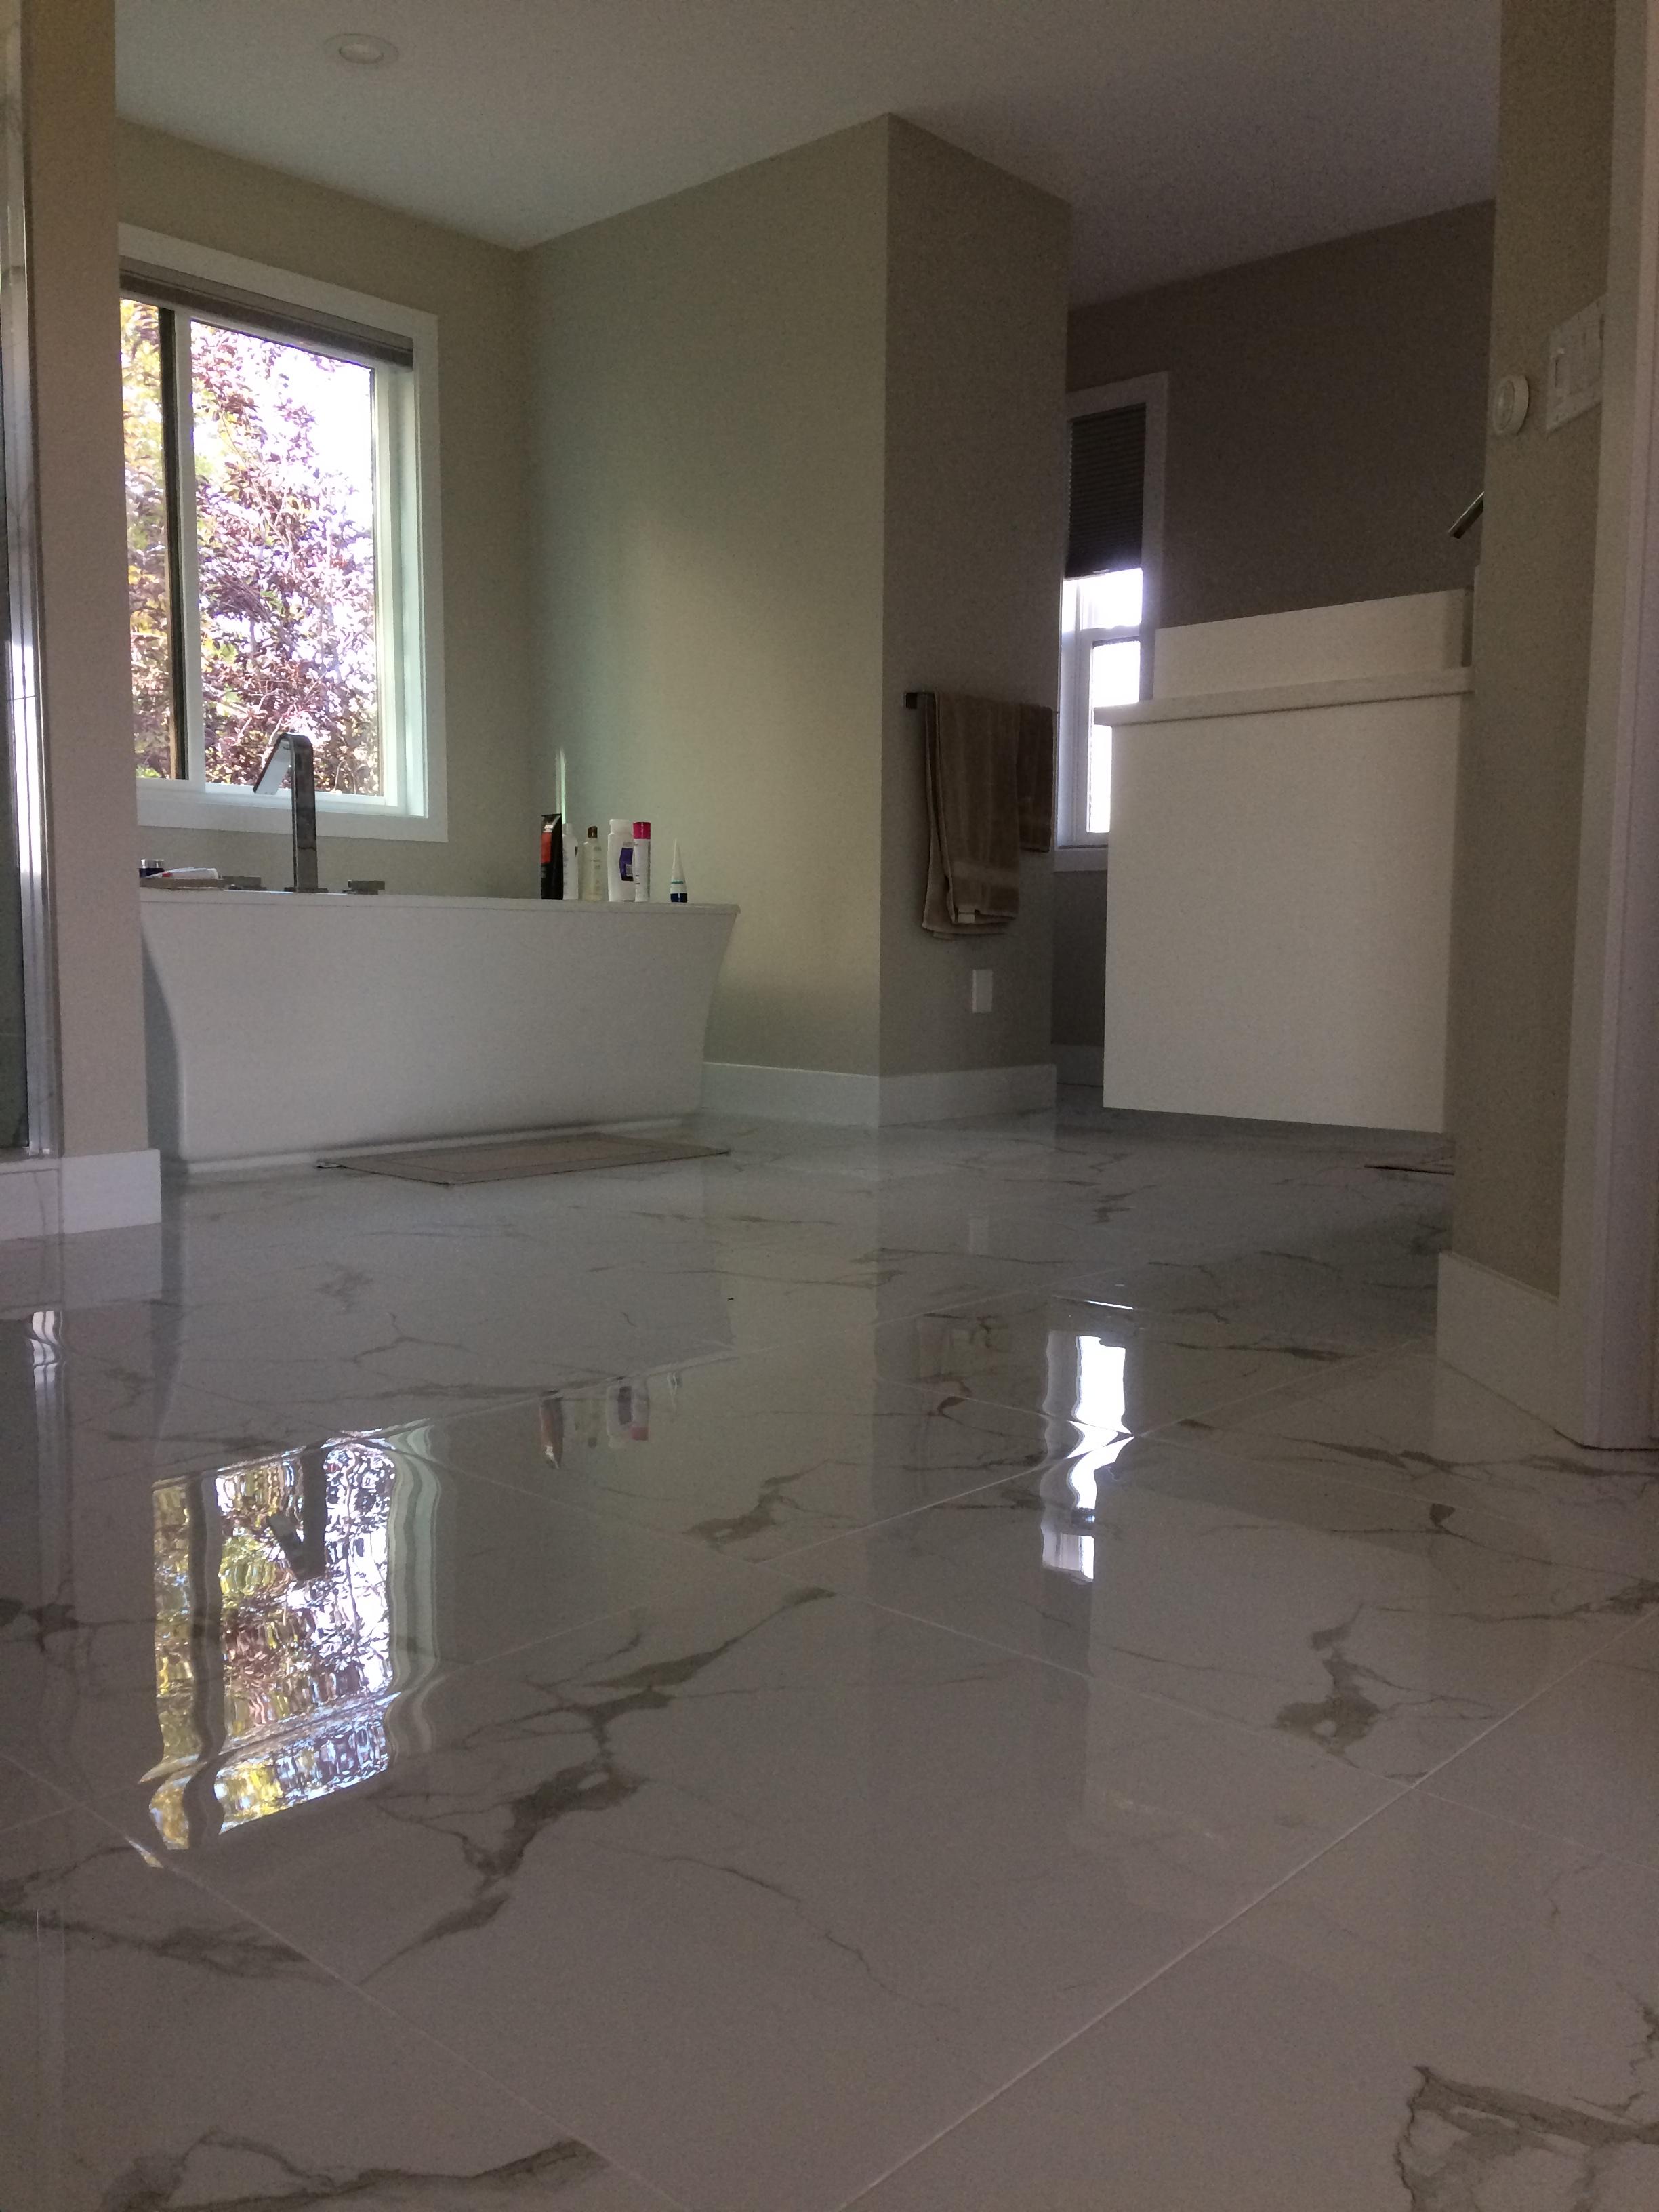 Gorgeous marble style flooring